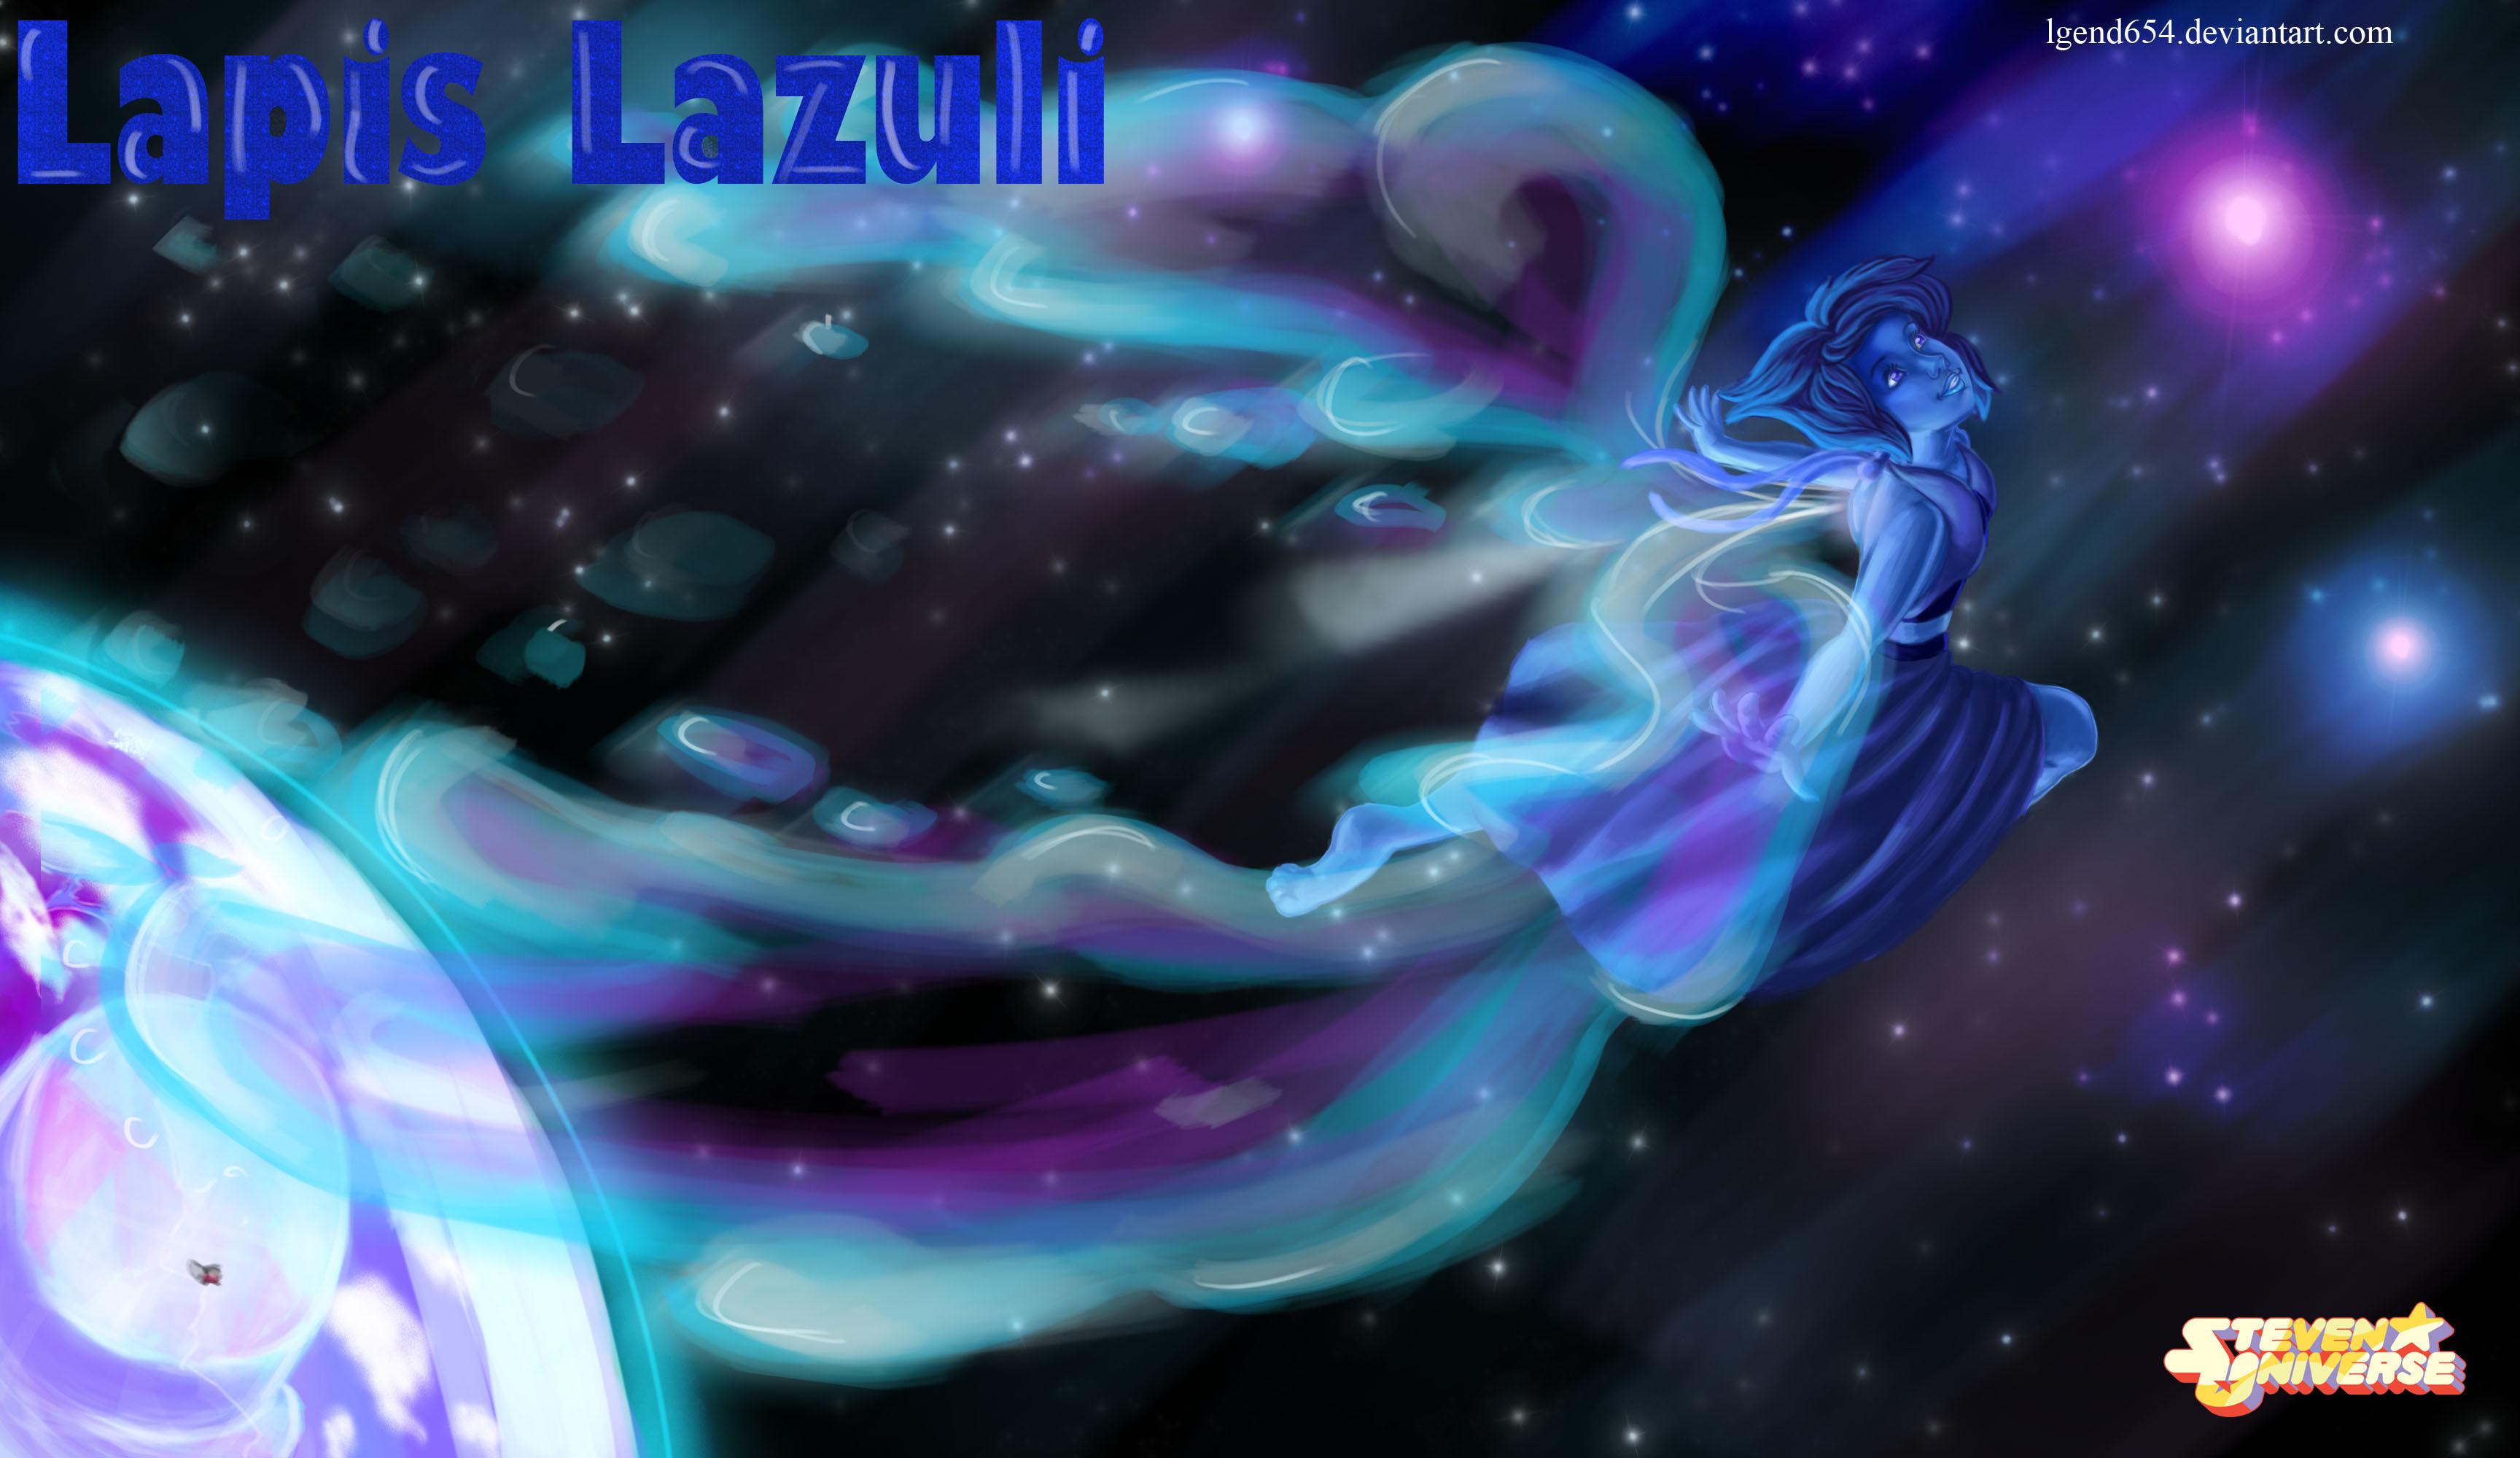 Lapis Lazuli Steven Universe wallpaper